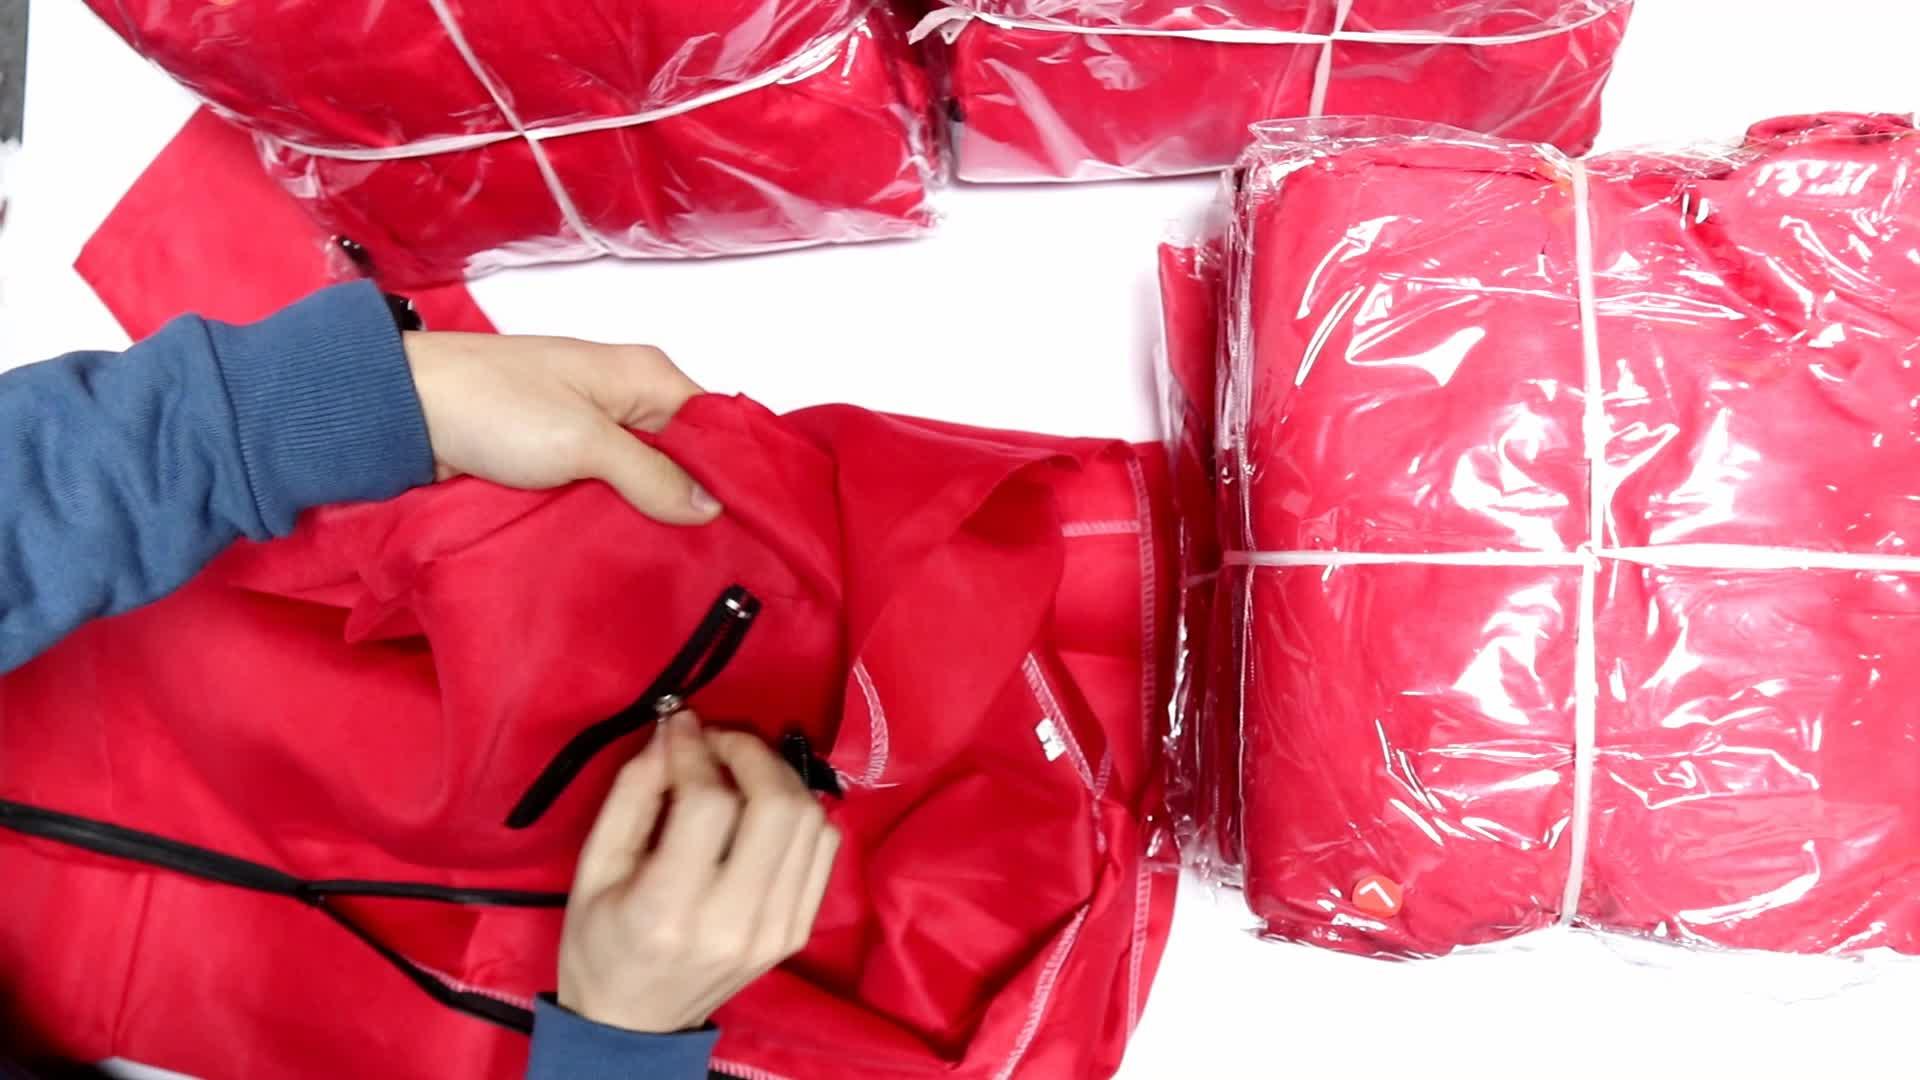 2020 gran oferta Dali Papel ropa disfraces Cosplay Salvador Dalí La Casa De Papel traje